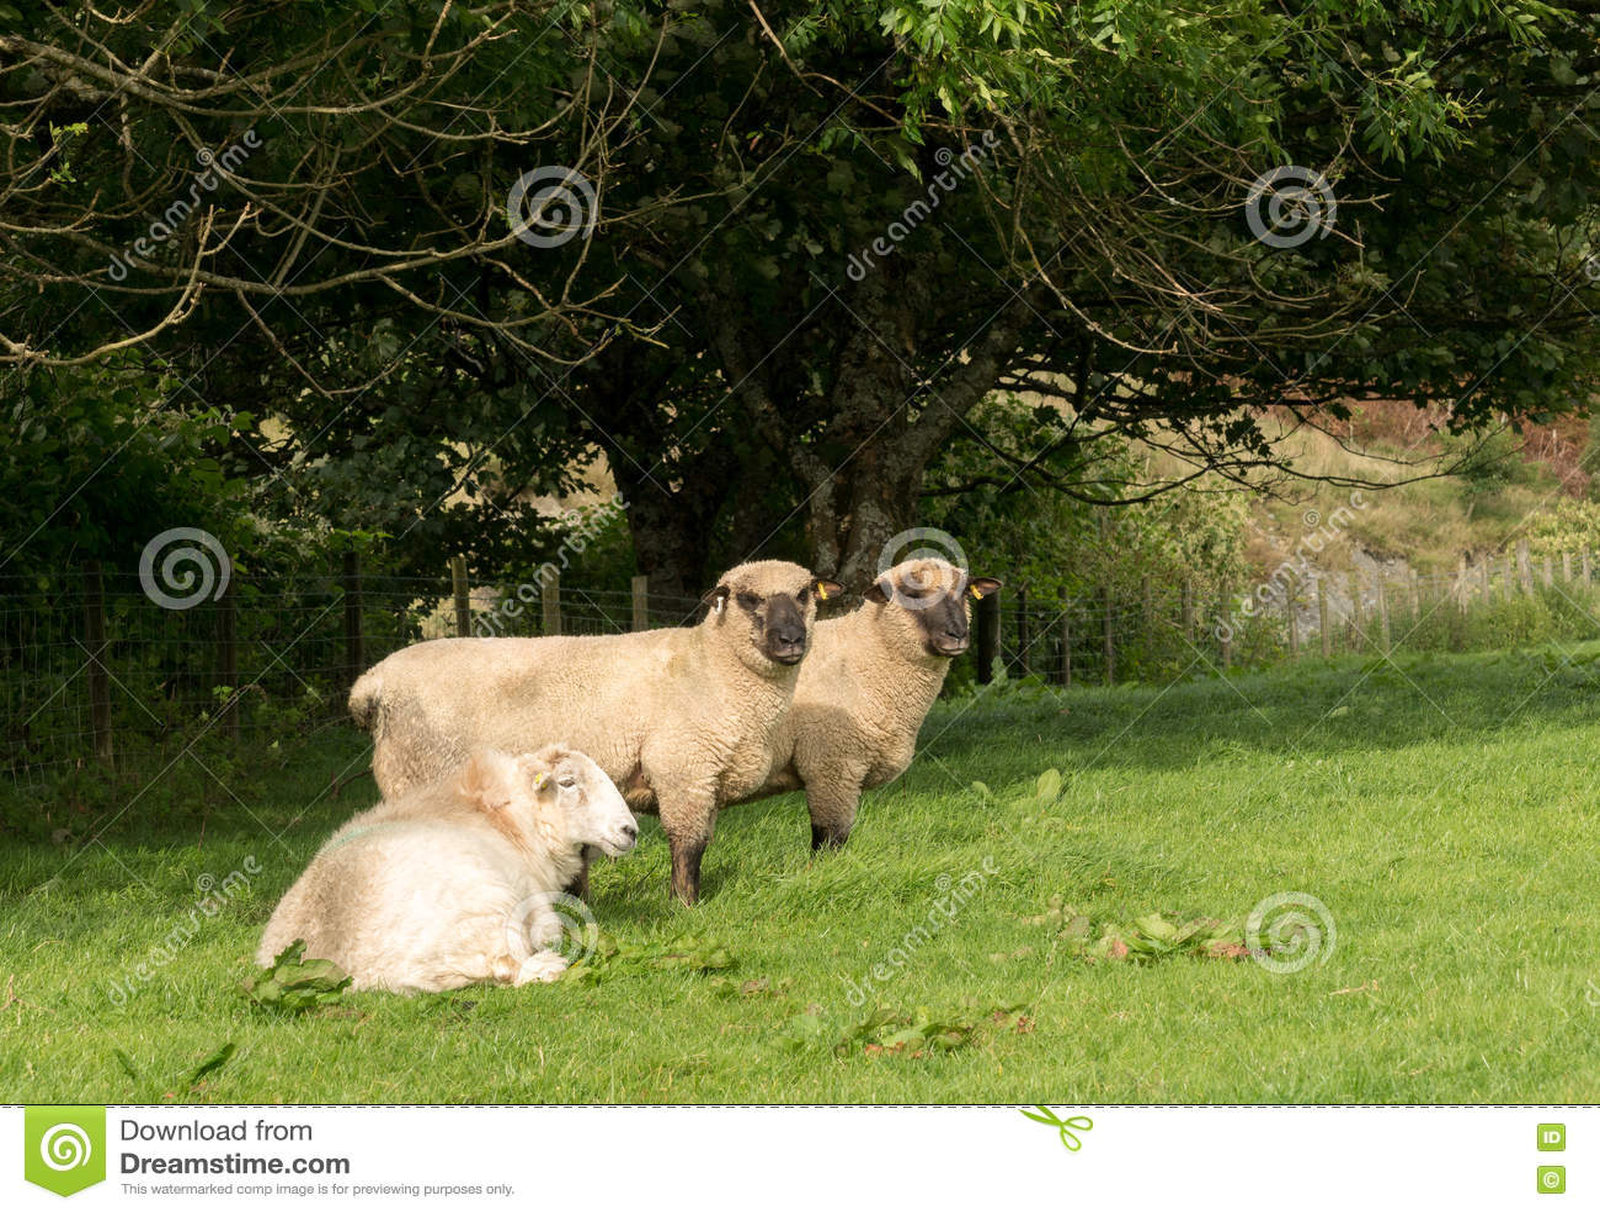 Vista lateral de las ovejas de Shropshire en prado